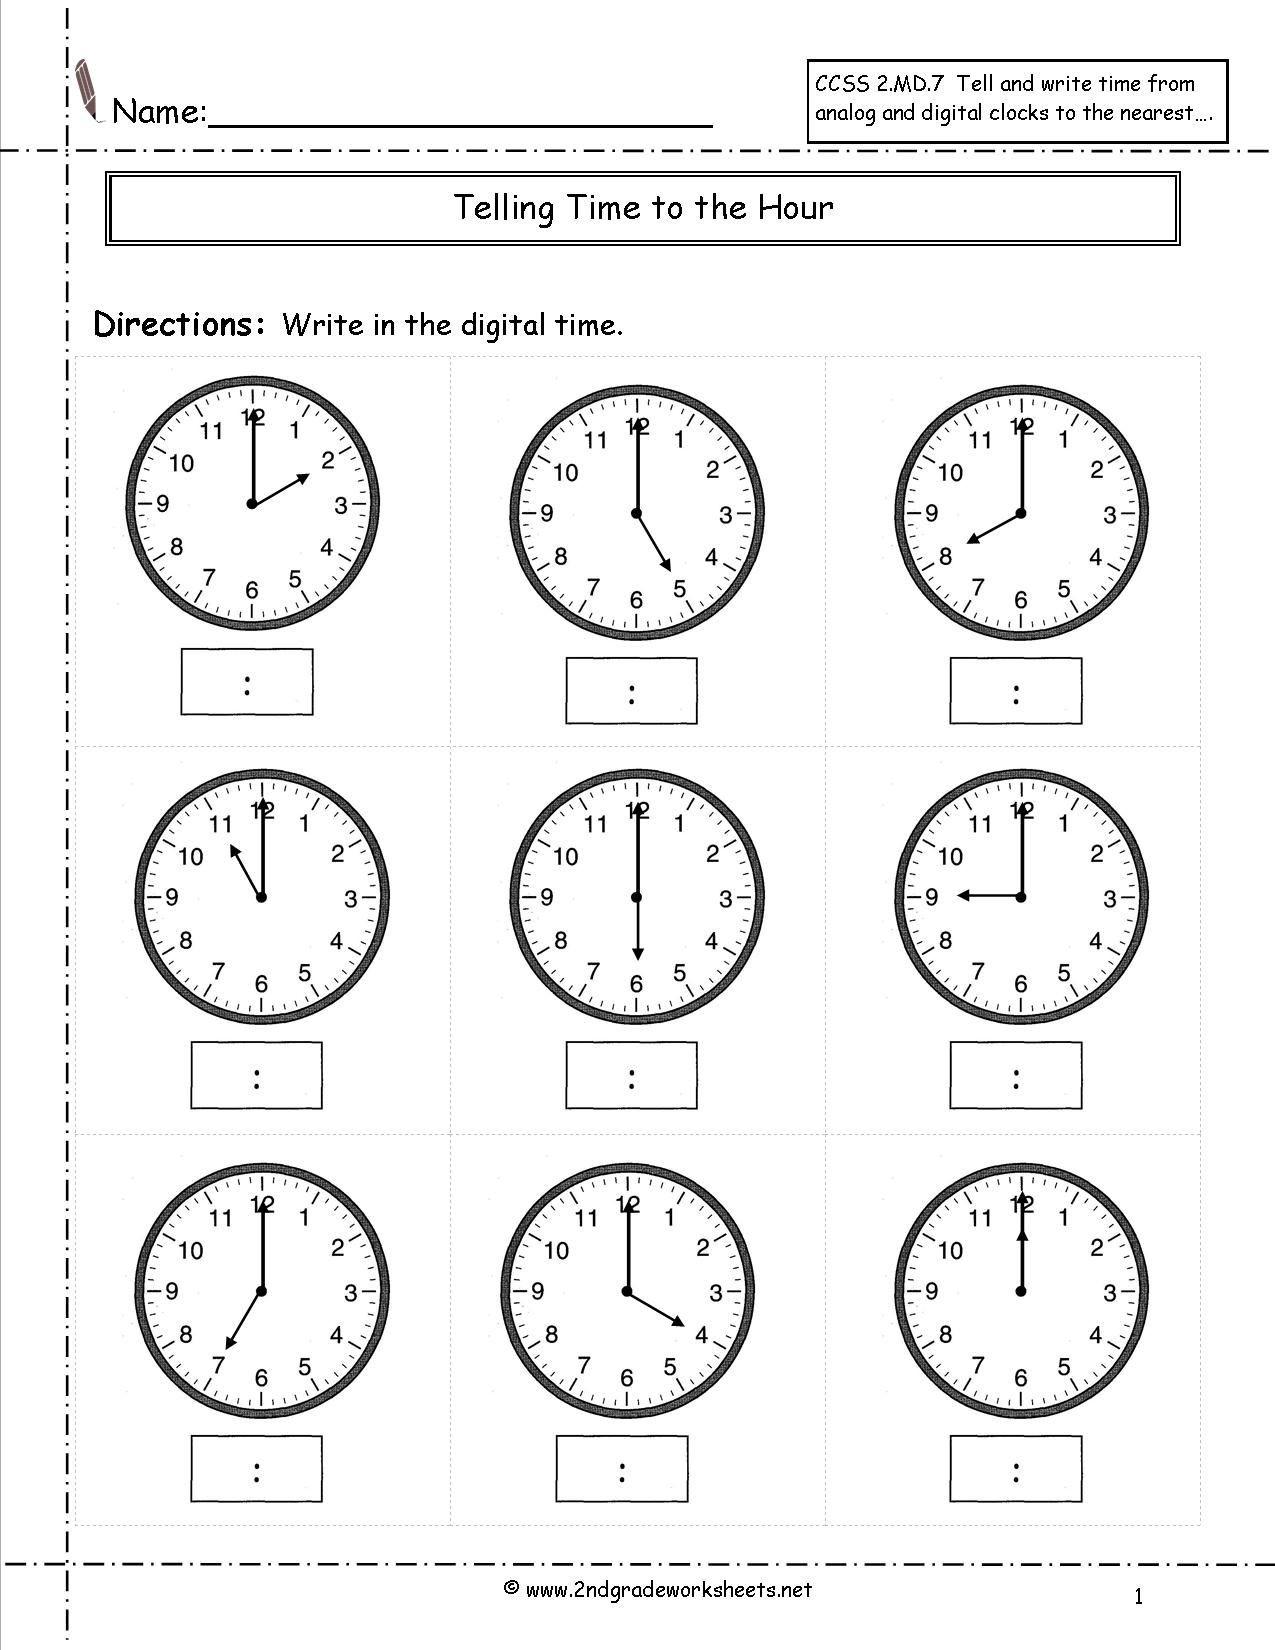 Geometry Worksheet 2nd Grade Telling Time Worksheets Half Hour Kids Math Free 2nd Grade